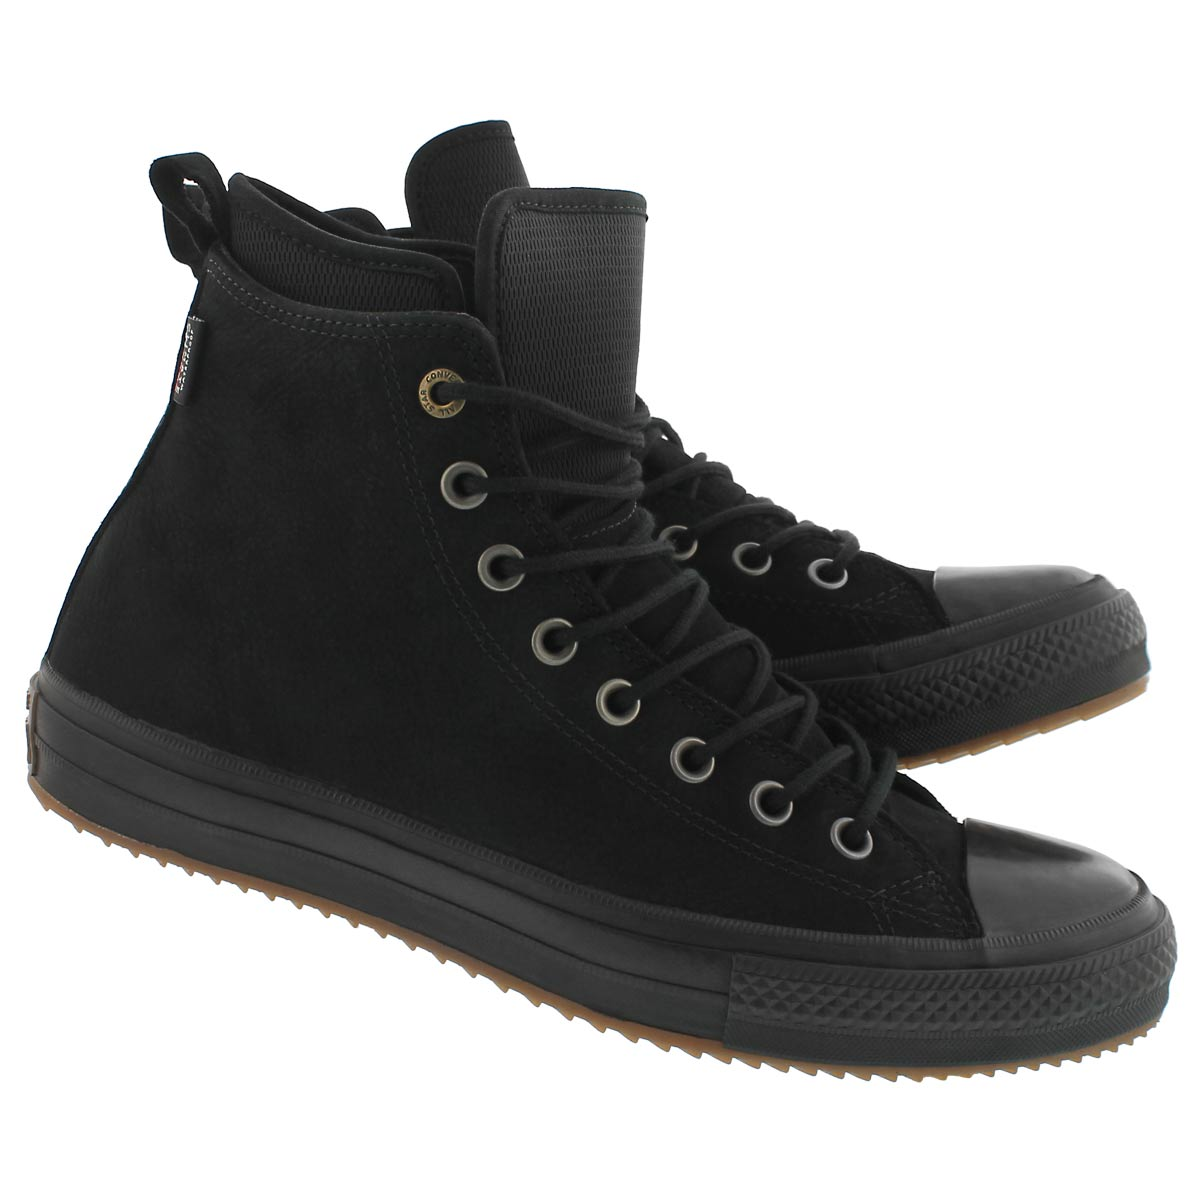 Mns CT Waterproof Hi black boot